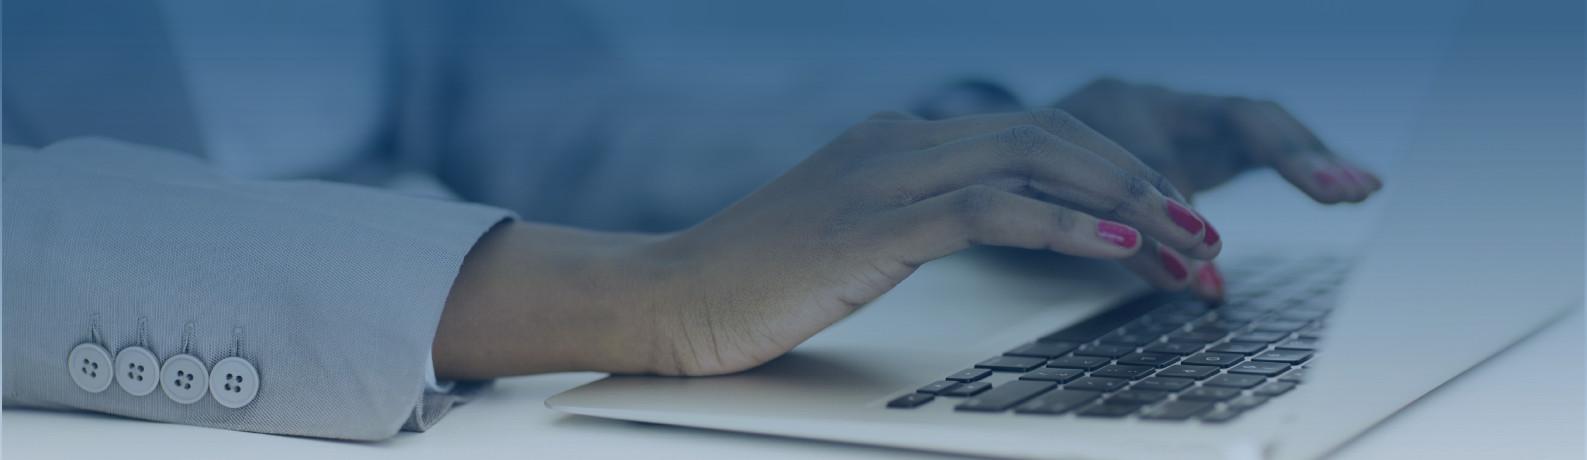 http://serpro.gov.br/menu/contato/cliente/perguntas-frequentes/suporte/suporte-perguntas-frequentes